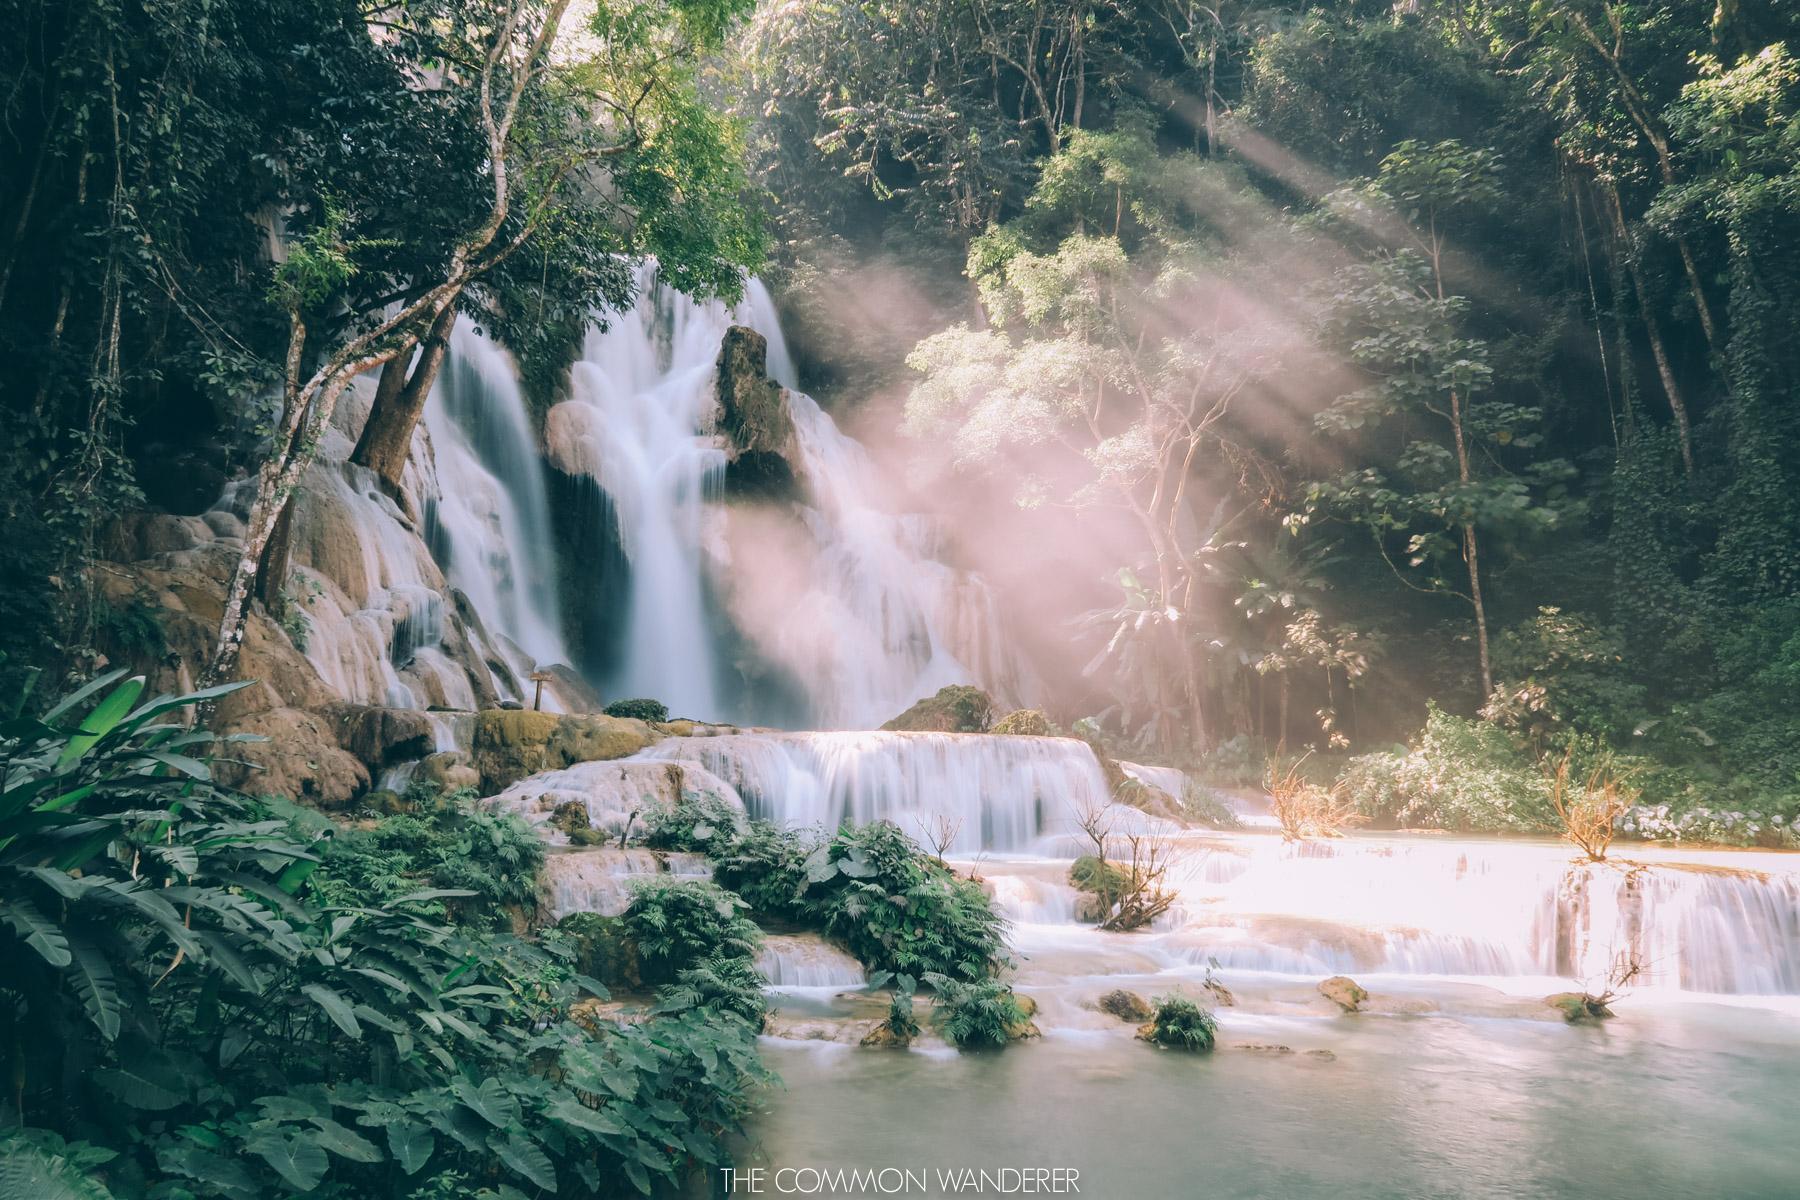 Luang Prabang things to do - Kuang Si Waterfall